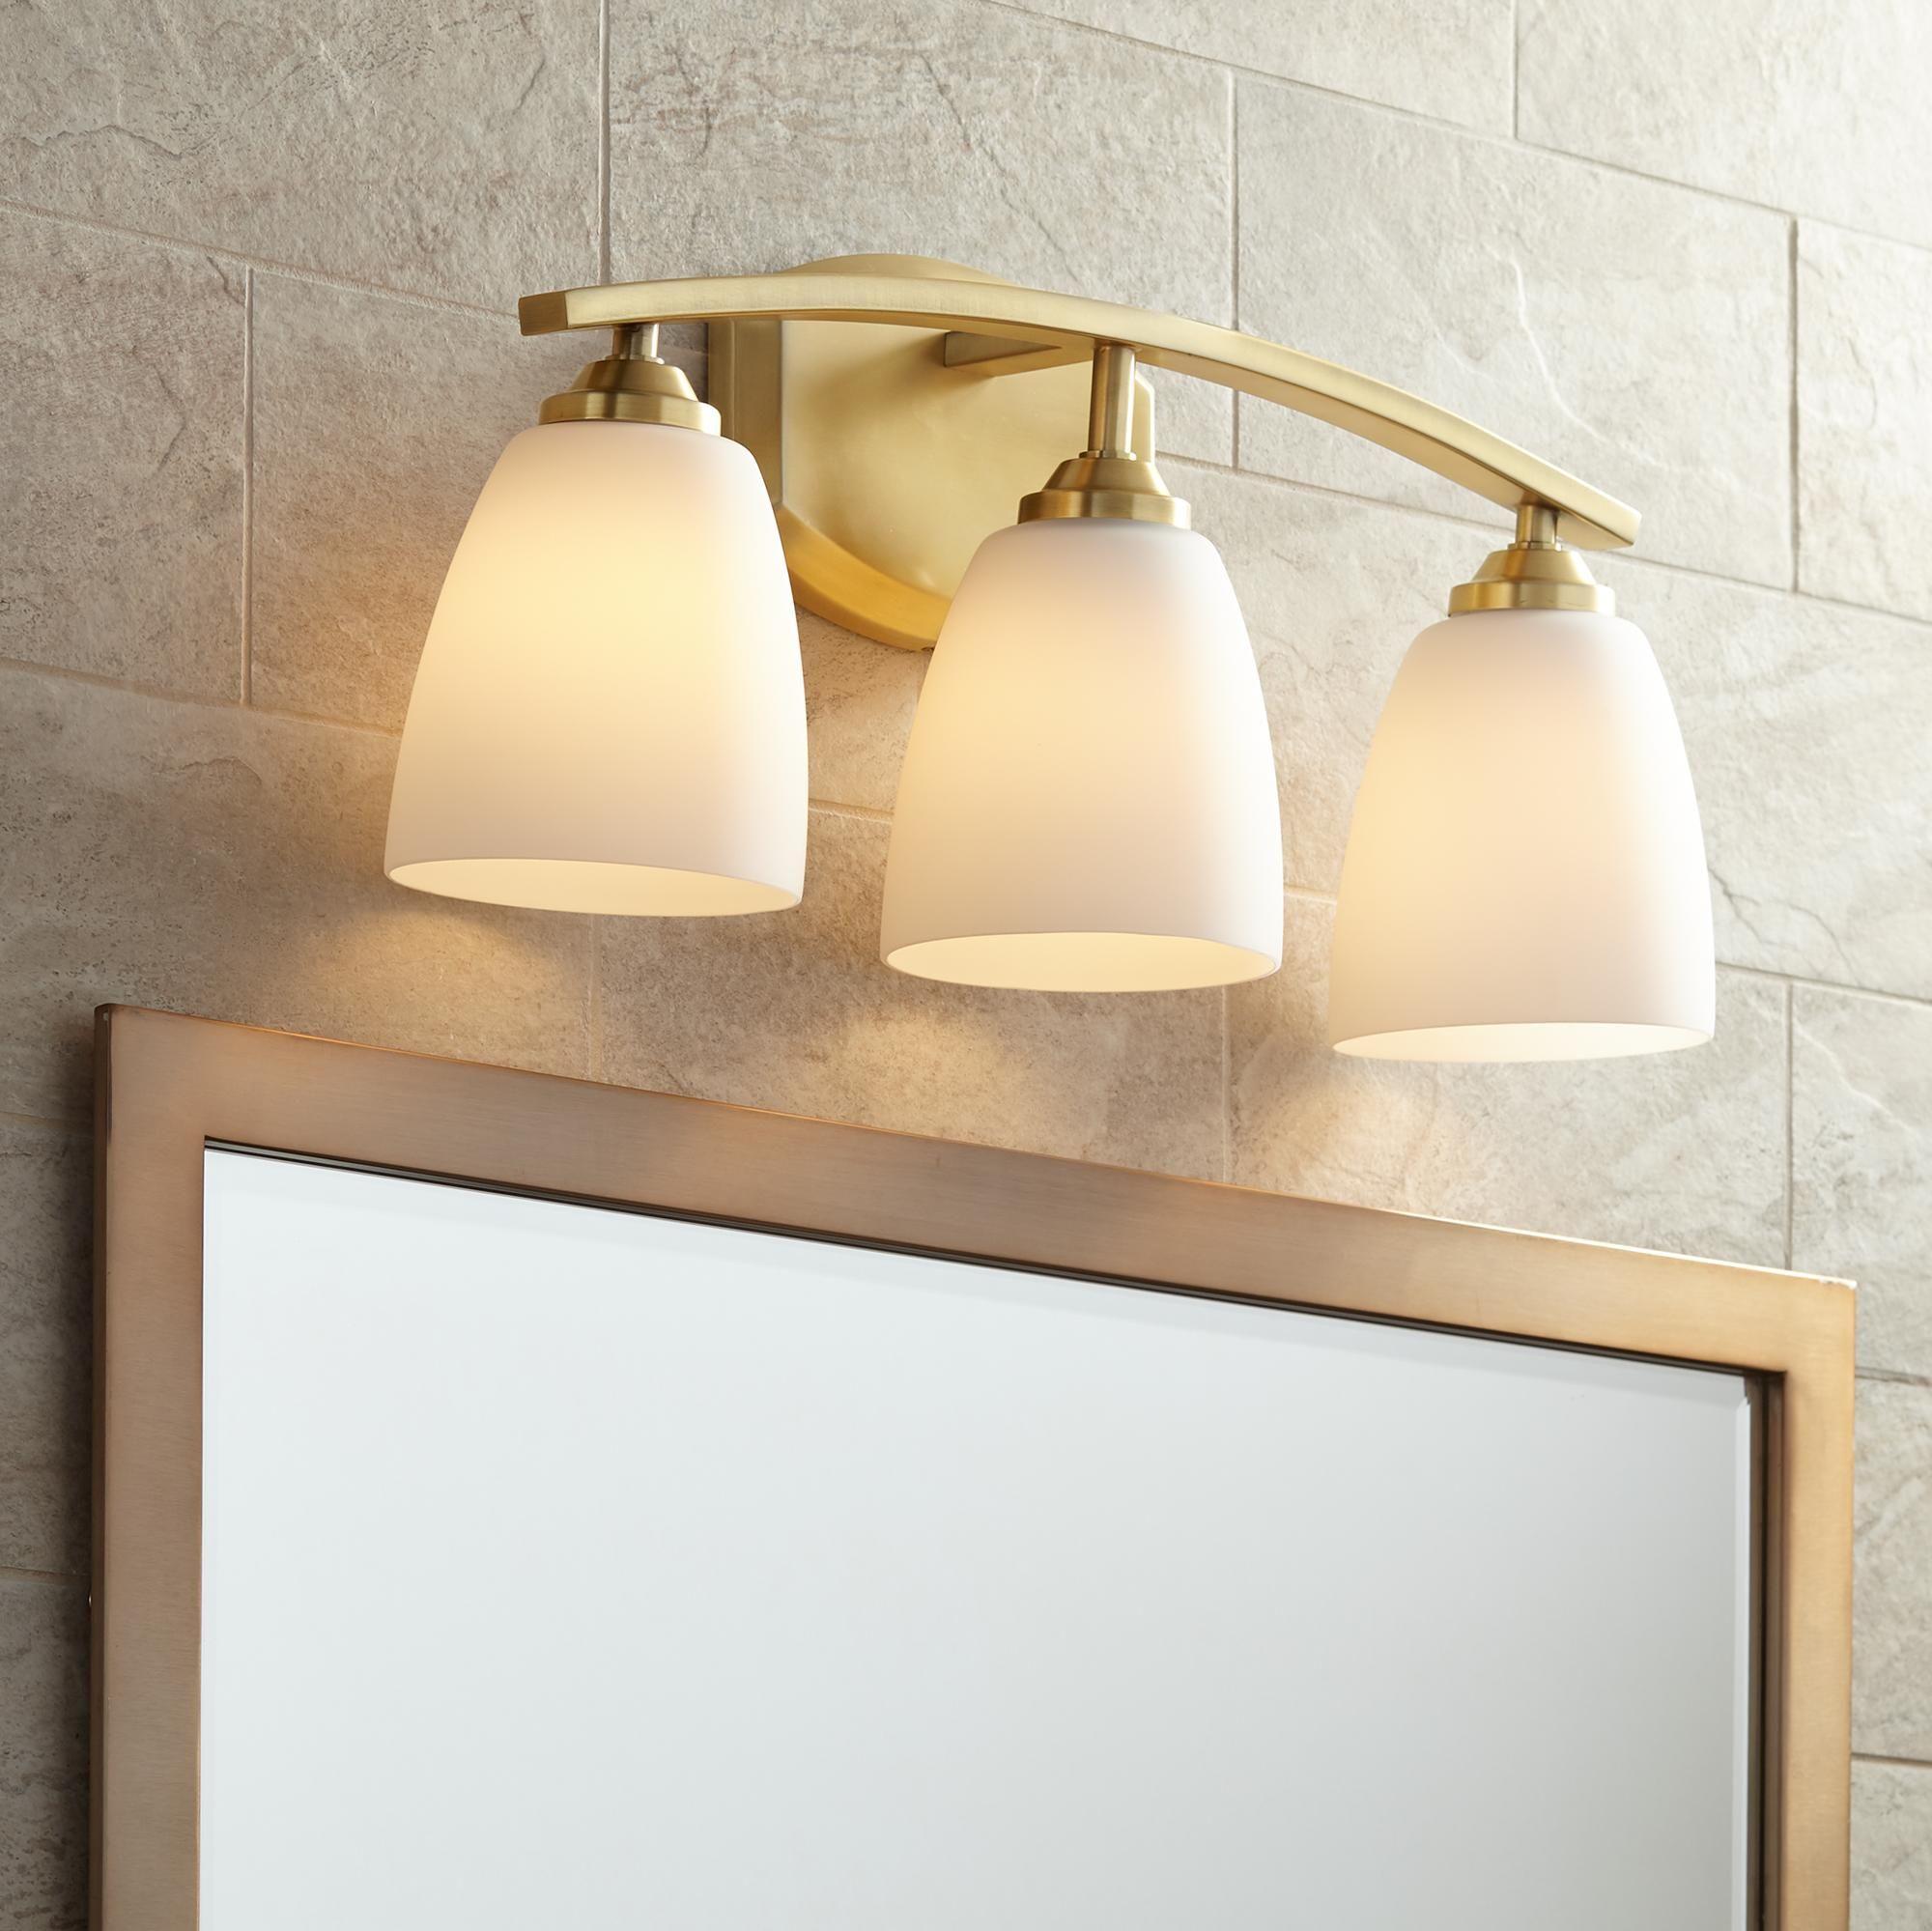 Bathroom Lighting Richter Opal 22 Wide Antique Brass 3 Light Bath Light Bath Light Bathroom Light Fixtures Bathroom Lighting